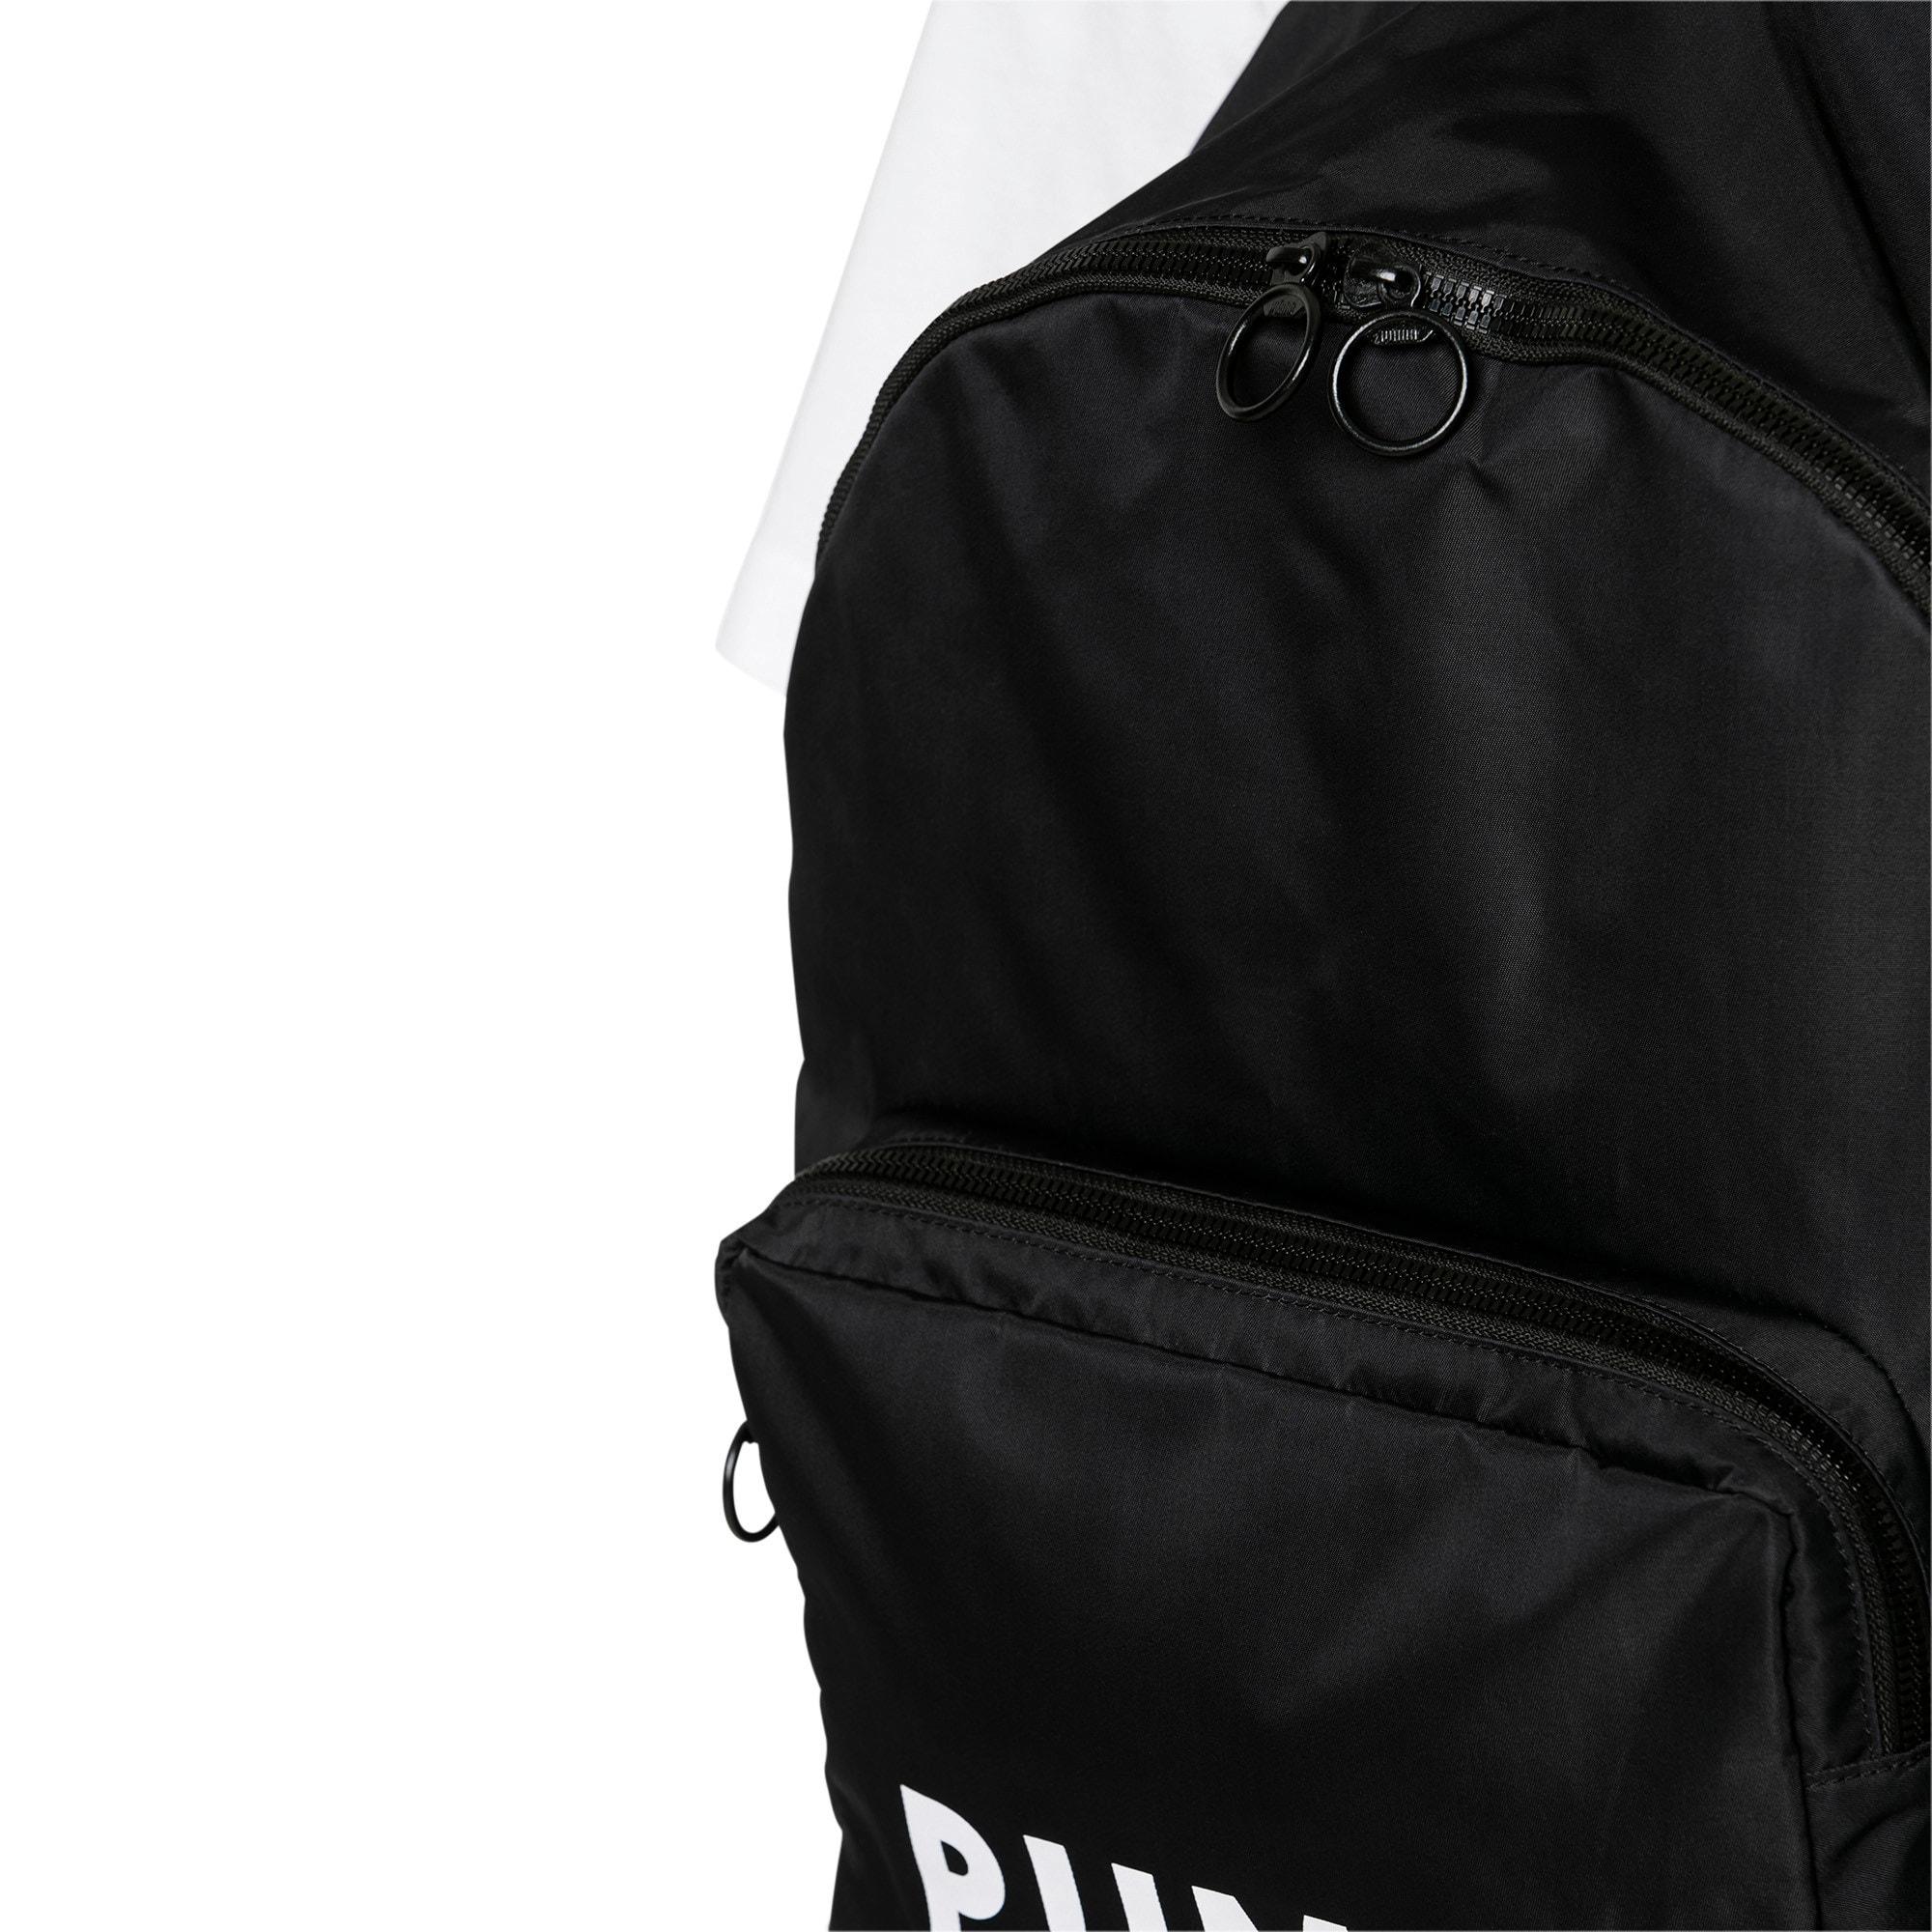 Thumbnail 3 of オリジナルス バックパック トレンド 24L, Puma Black, medium-JPN